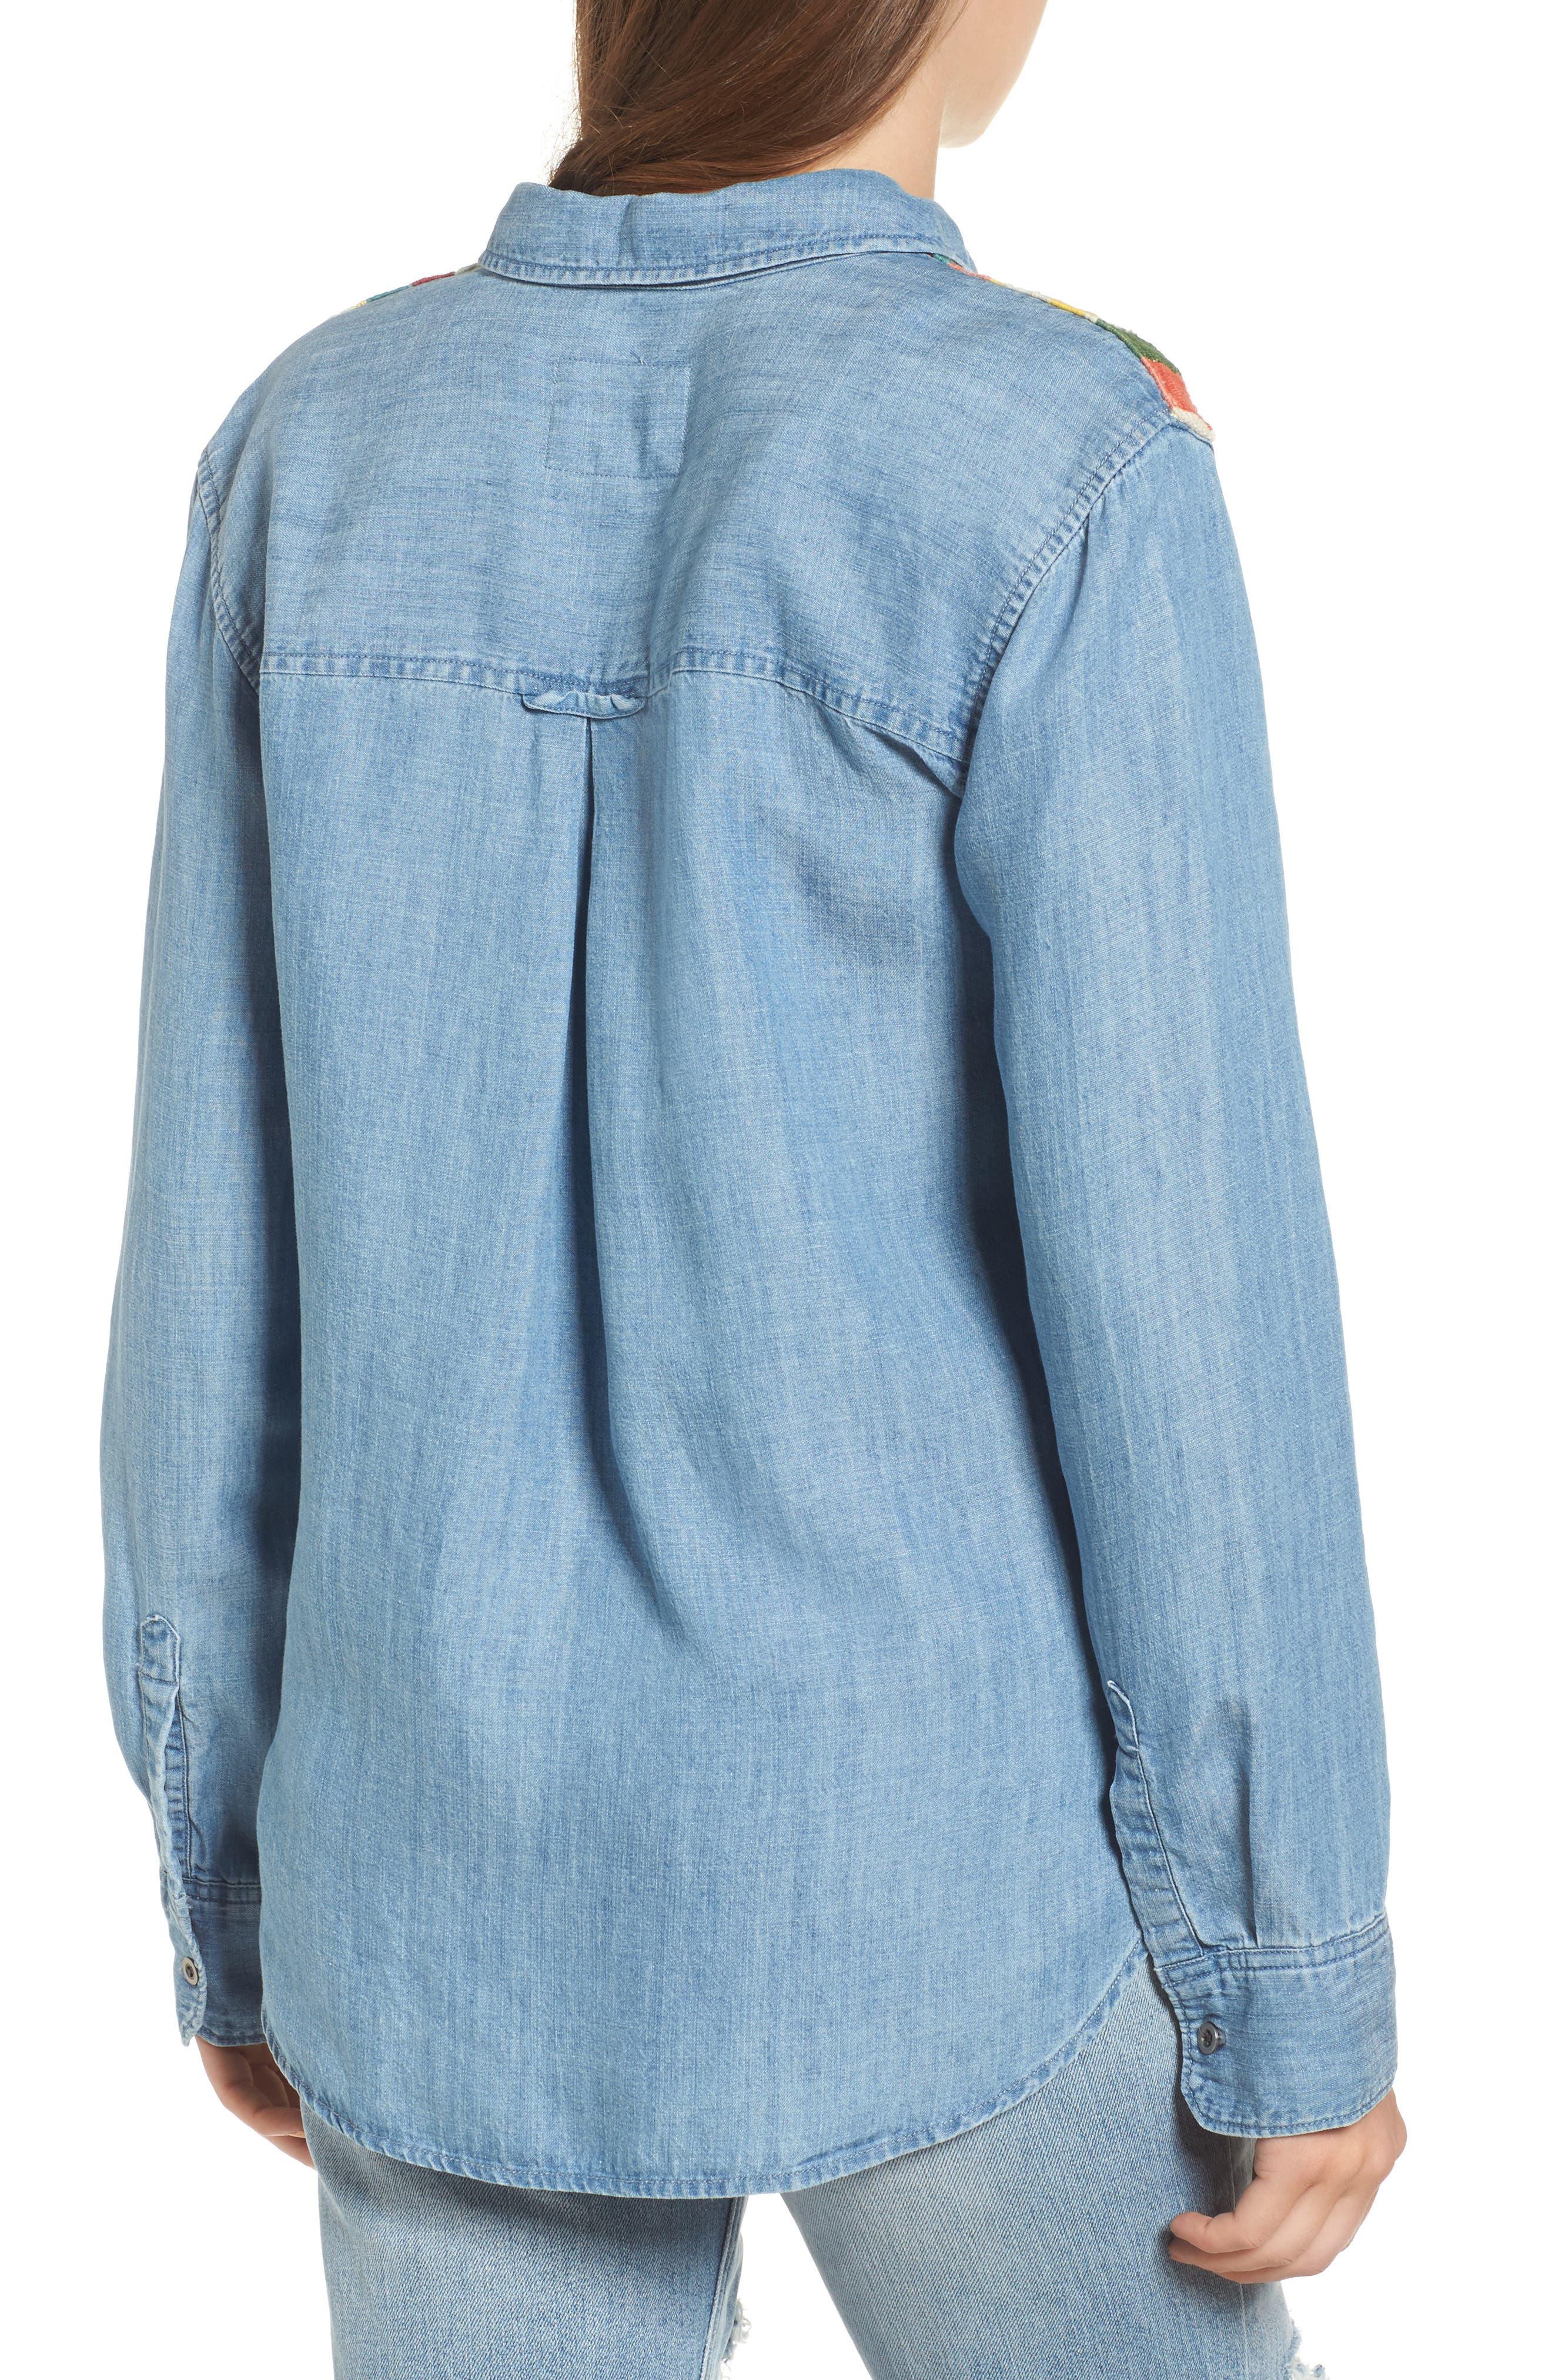 Jimi Chambray Shirt,                             Alternate thumbnail 2, color,                             493